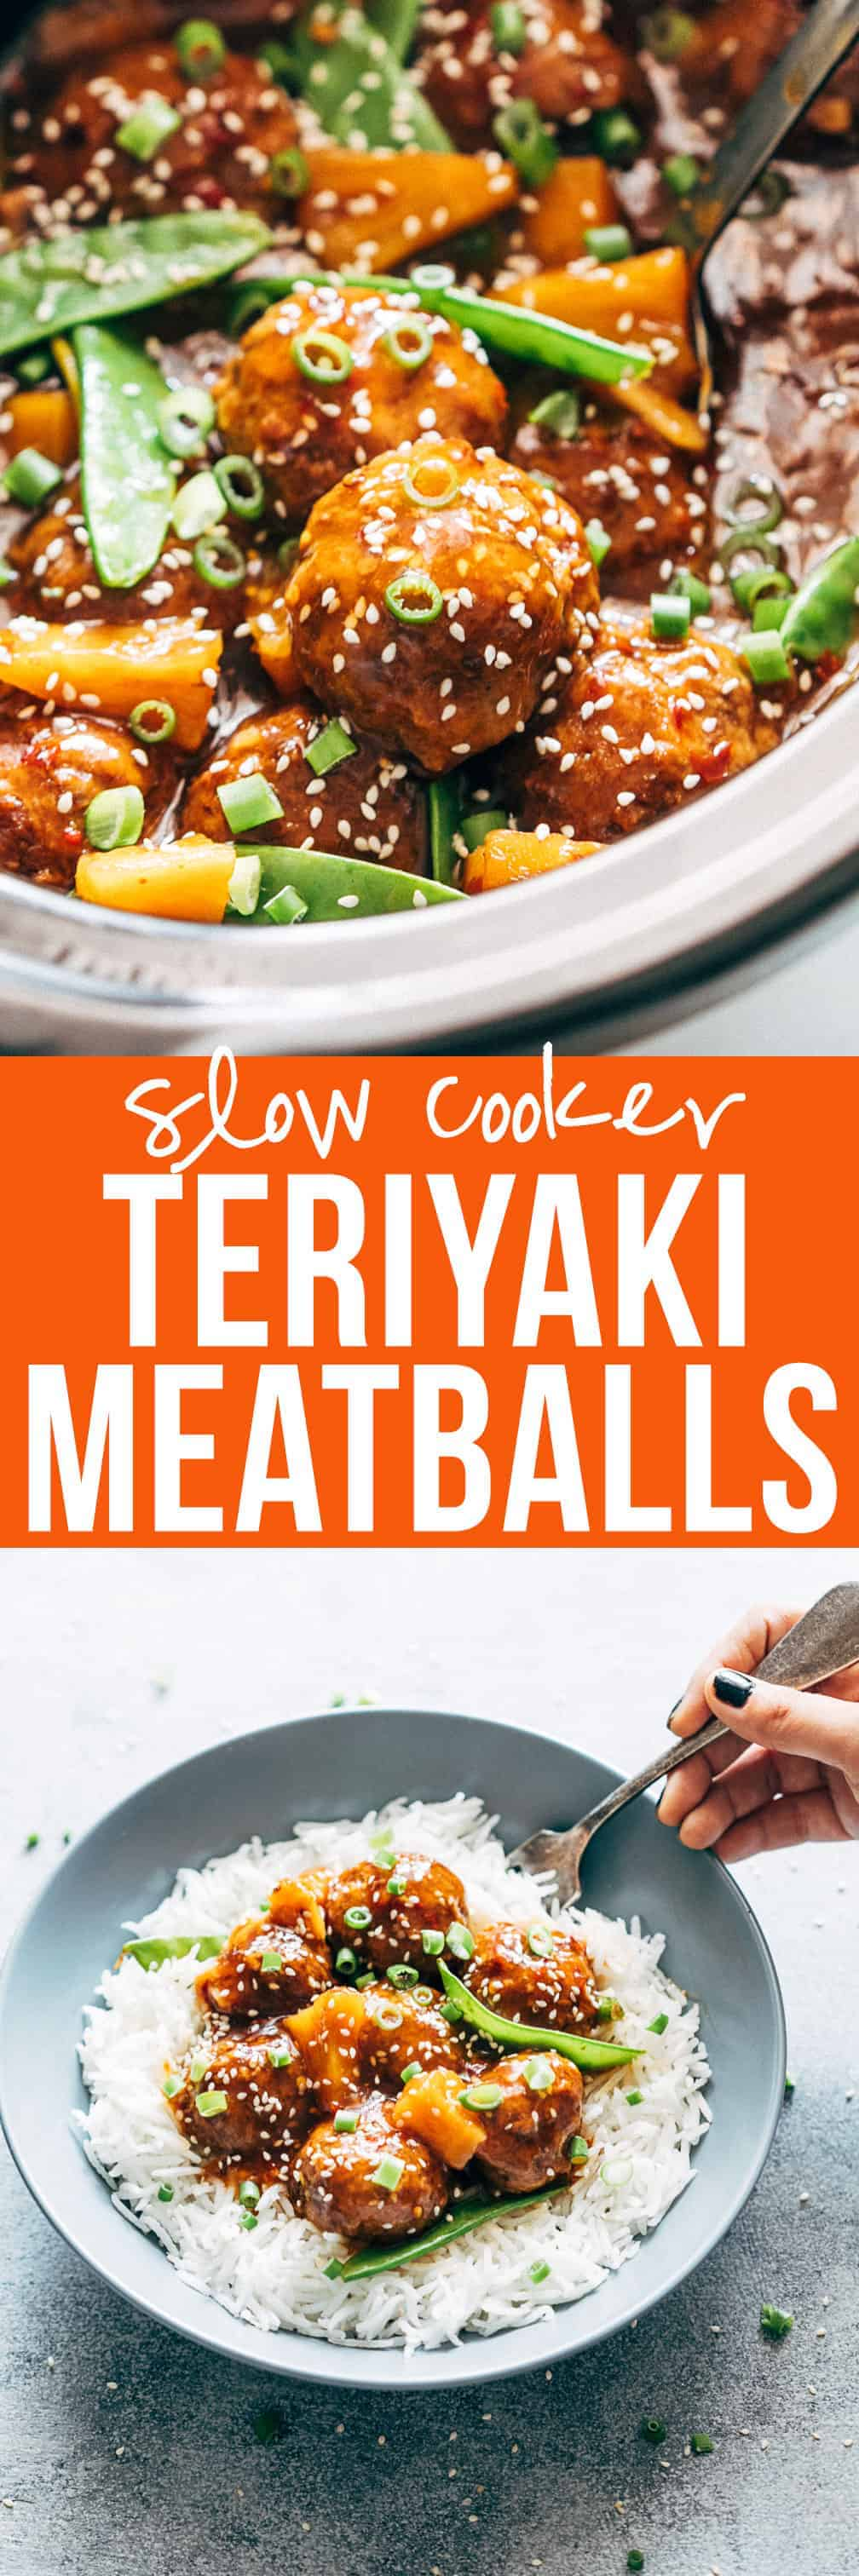 Crockpot Teriyaki Meatballs | Teriyaki Pineapple Meatballs | Asian Meatballs | Japanese Meatballs | Slow Cooker Dinner Recipes | Easy Recipes | Beef Meatballs | Pork Meatballs | Meatballs and Noodles | Meatballs and Rice